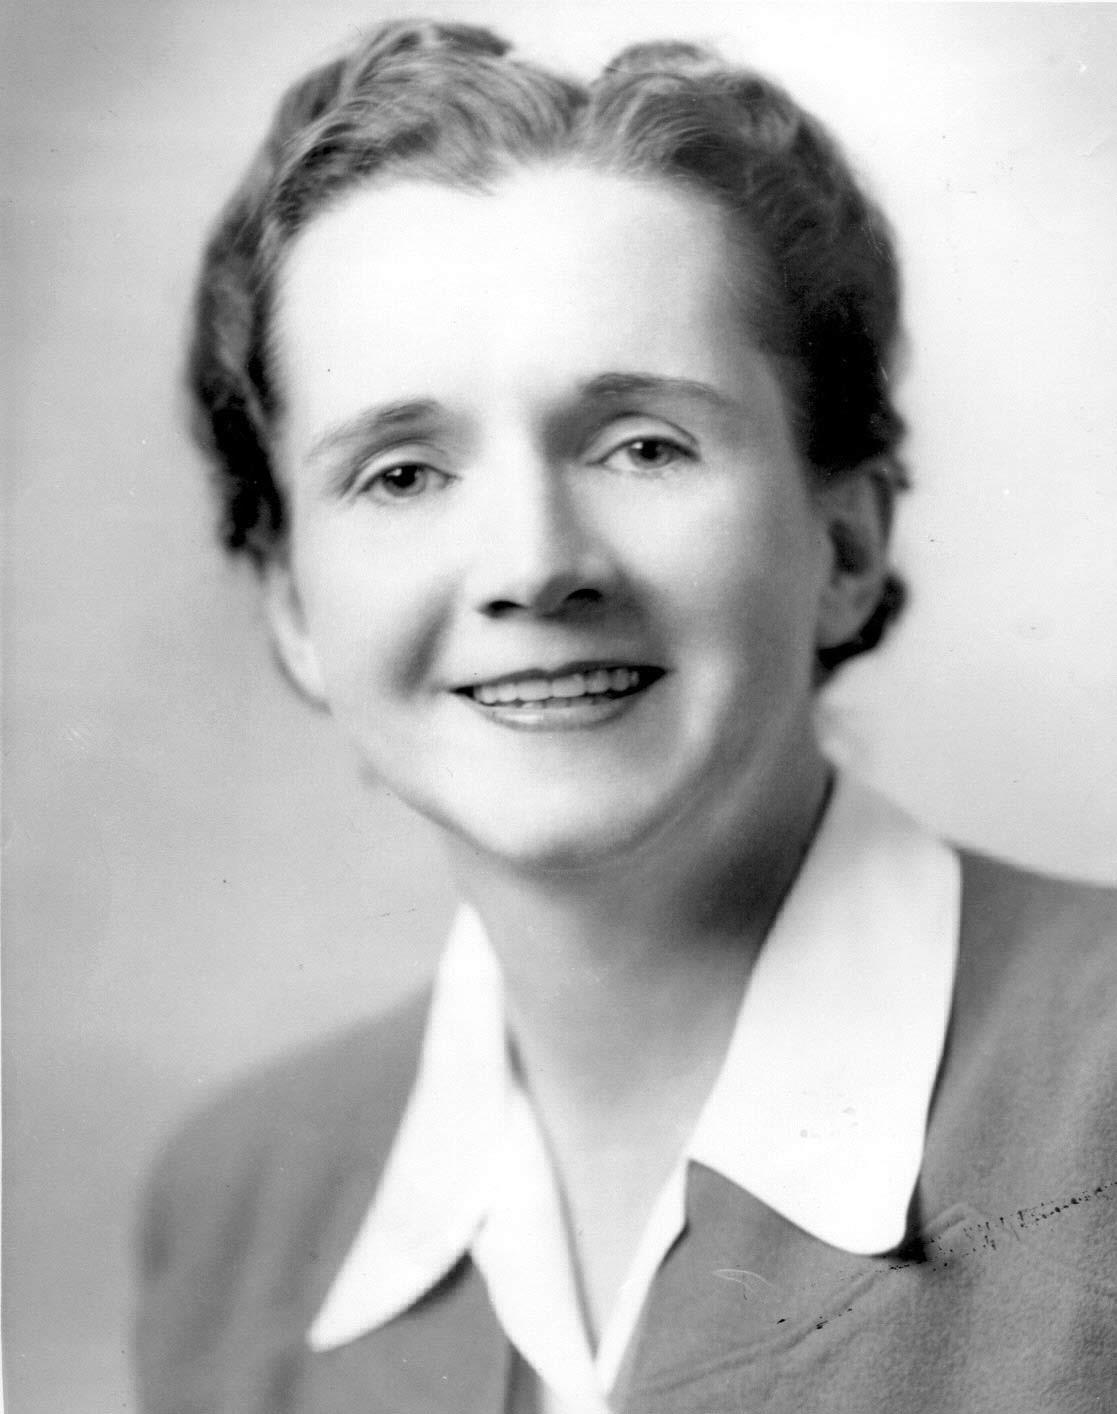 http://upload.wikimedia.org/wikipedia/commons/f/f4/Rachel-Carson.jpg